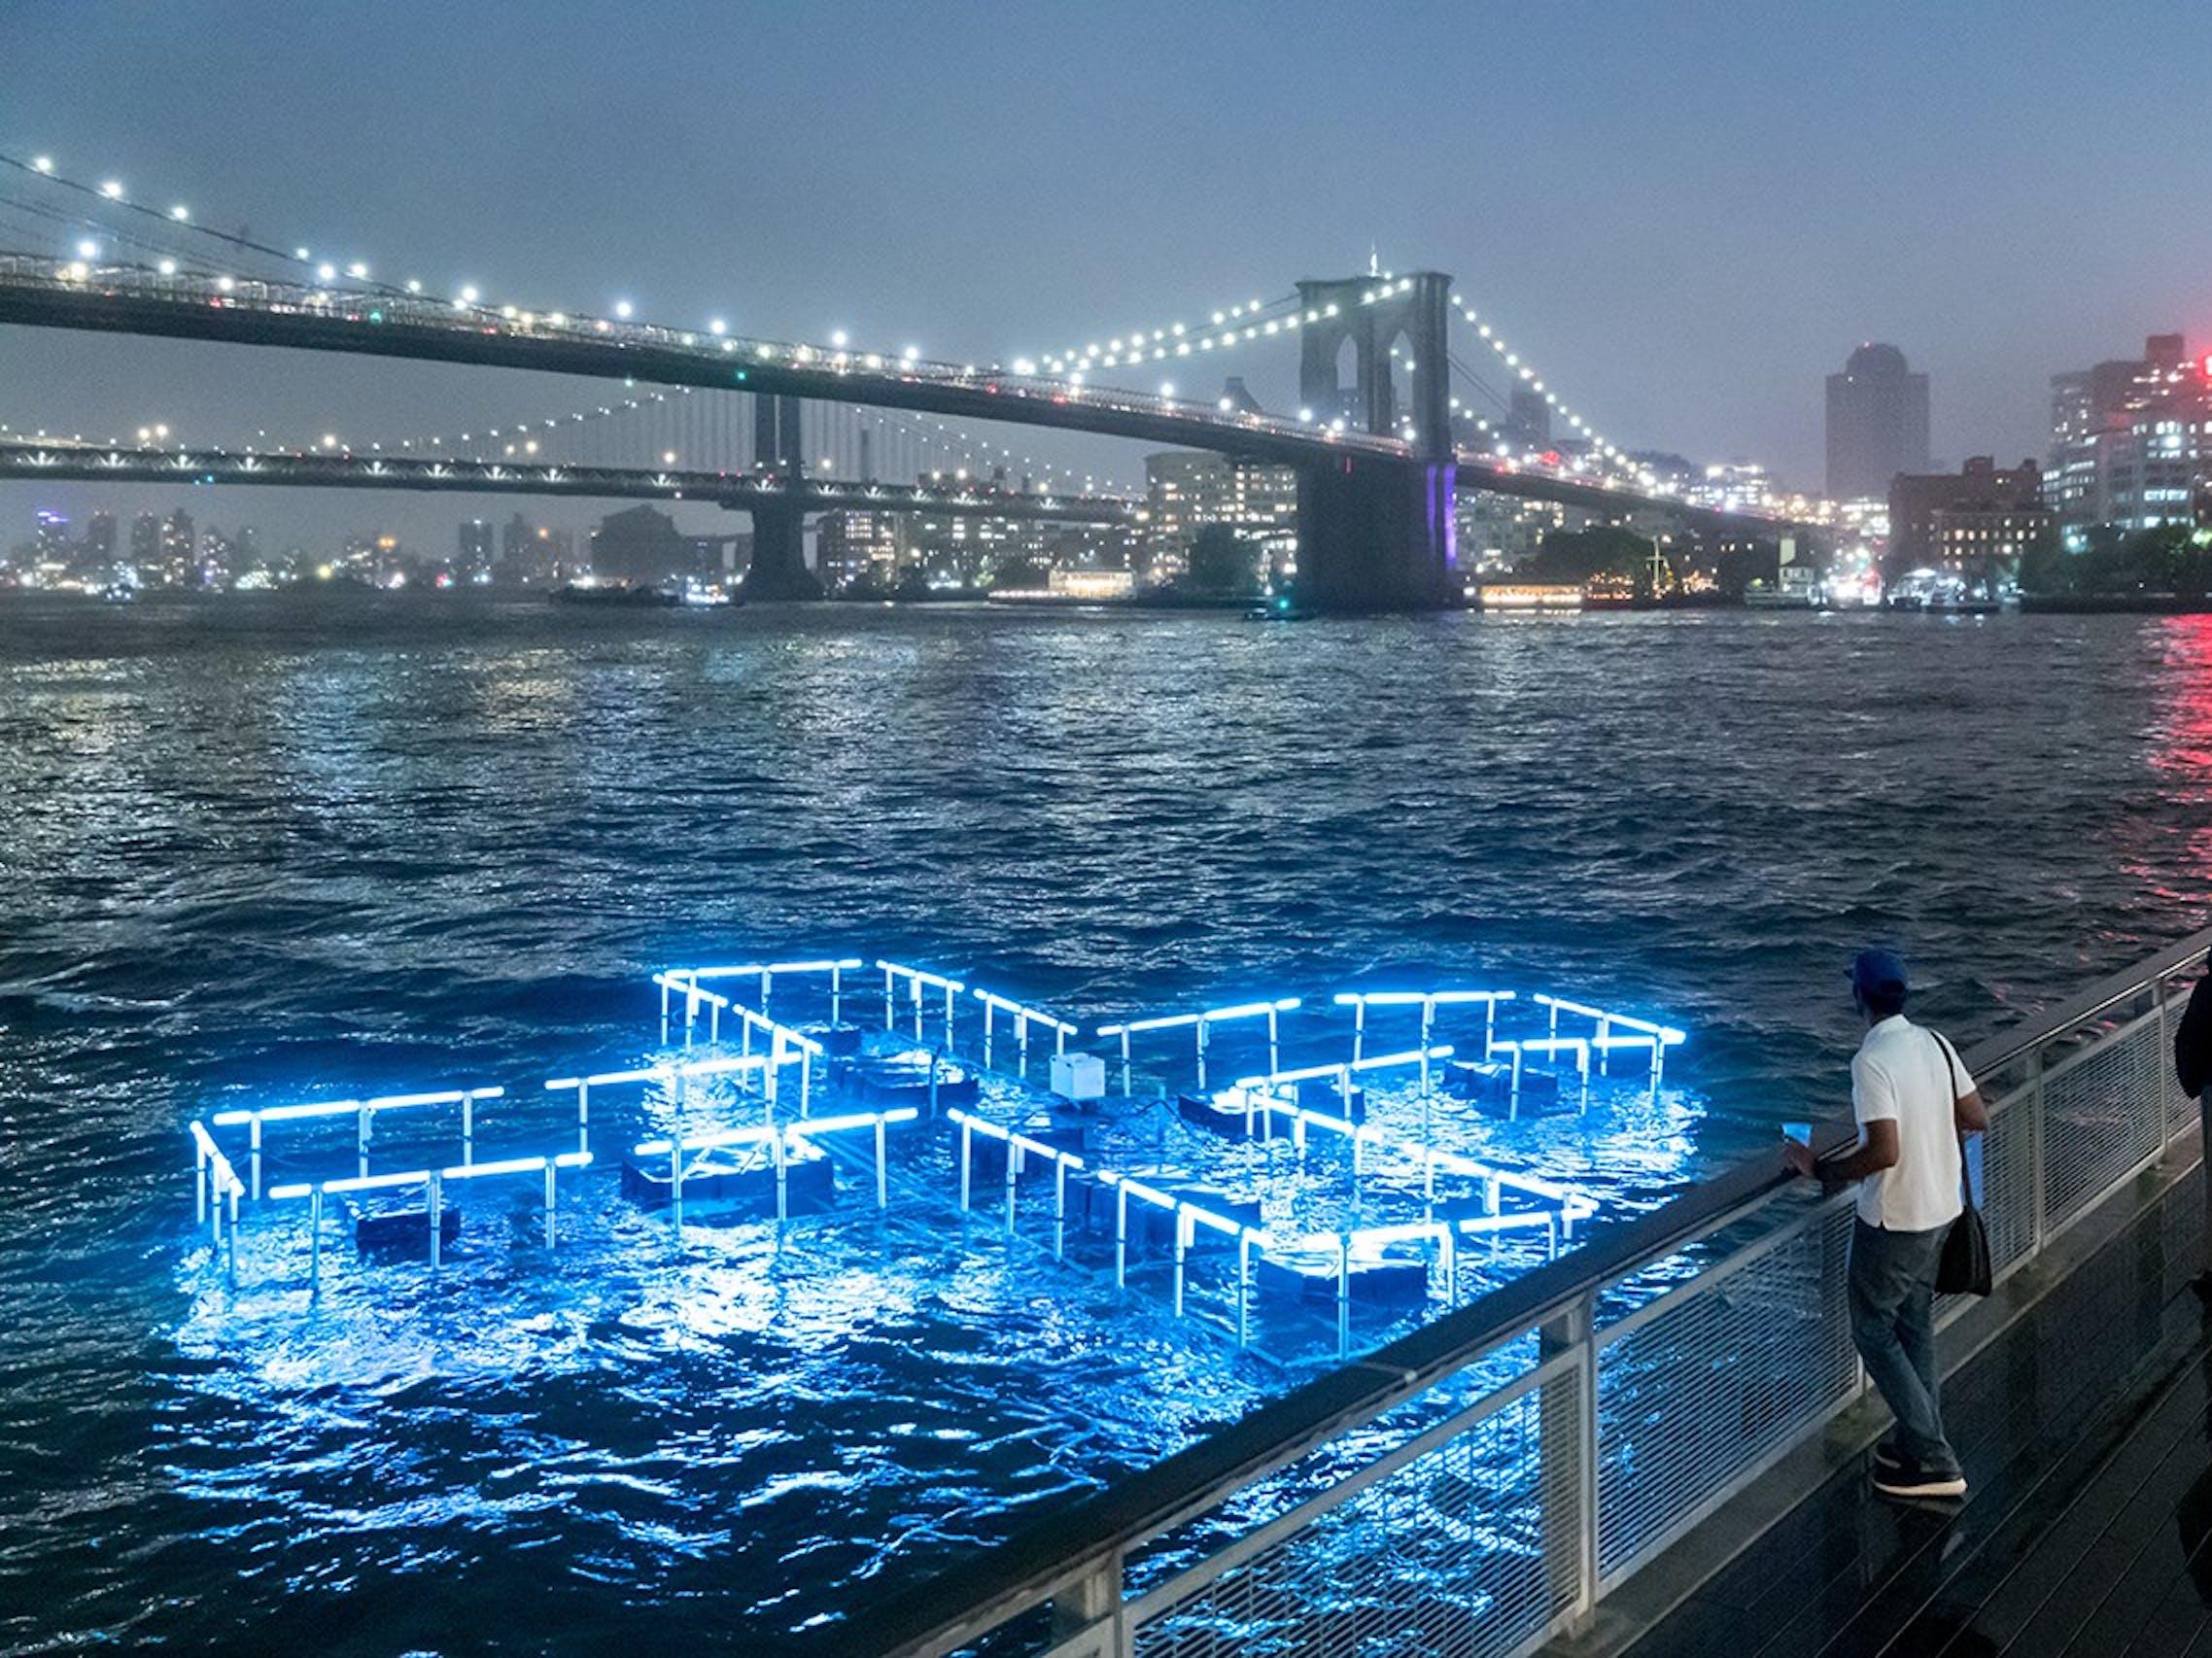 Plus Pool, East River